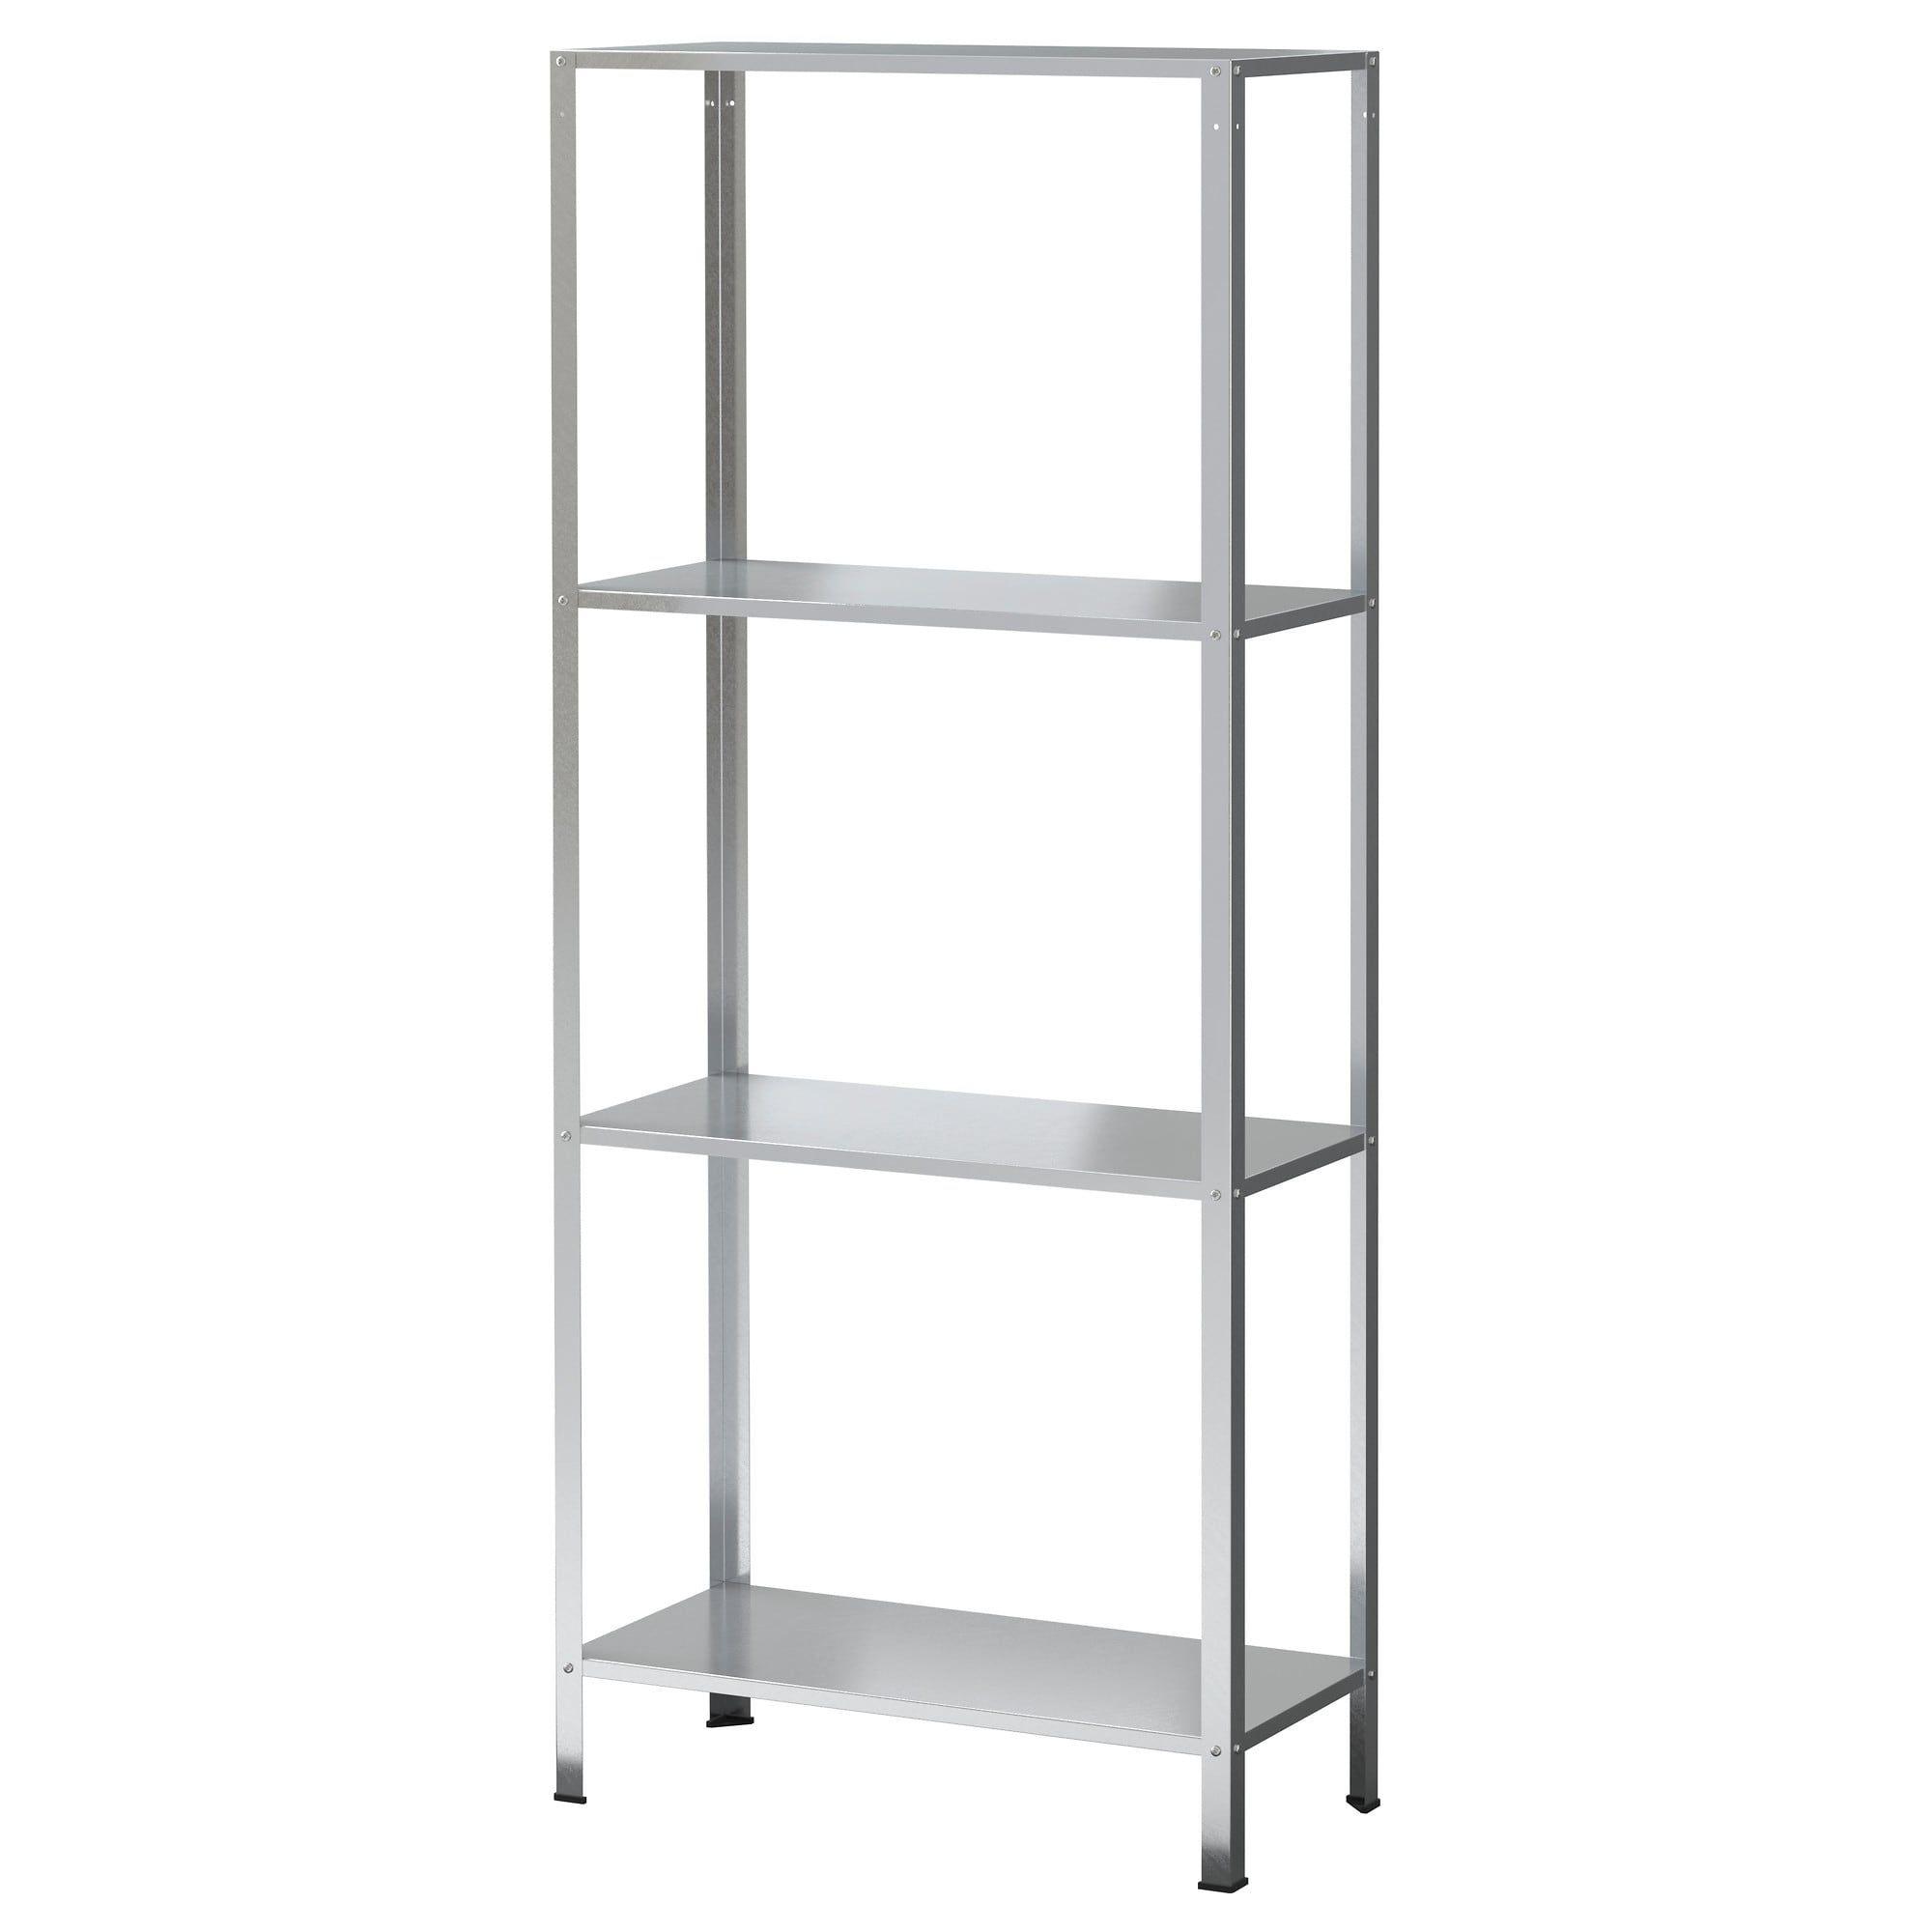 Hyllis Shelf Unit Ikea Add Wood Shelves For A Rustic Look And Paint It Black Ikea Shelves Ikea Shelves